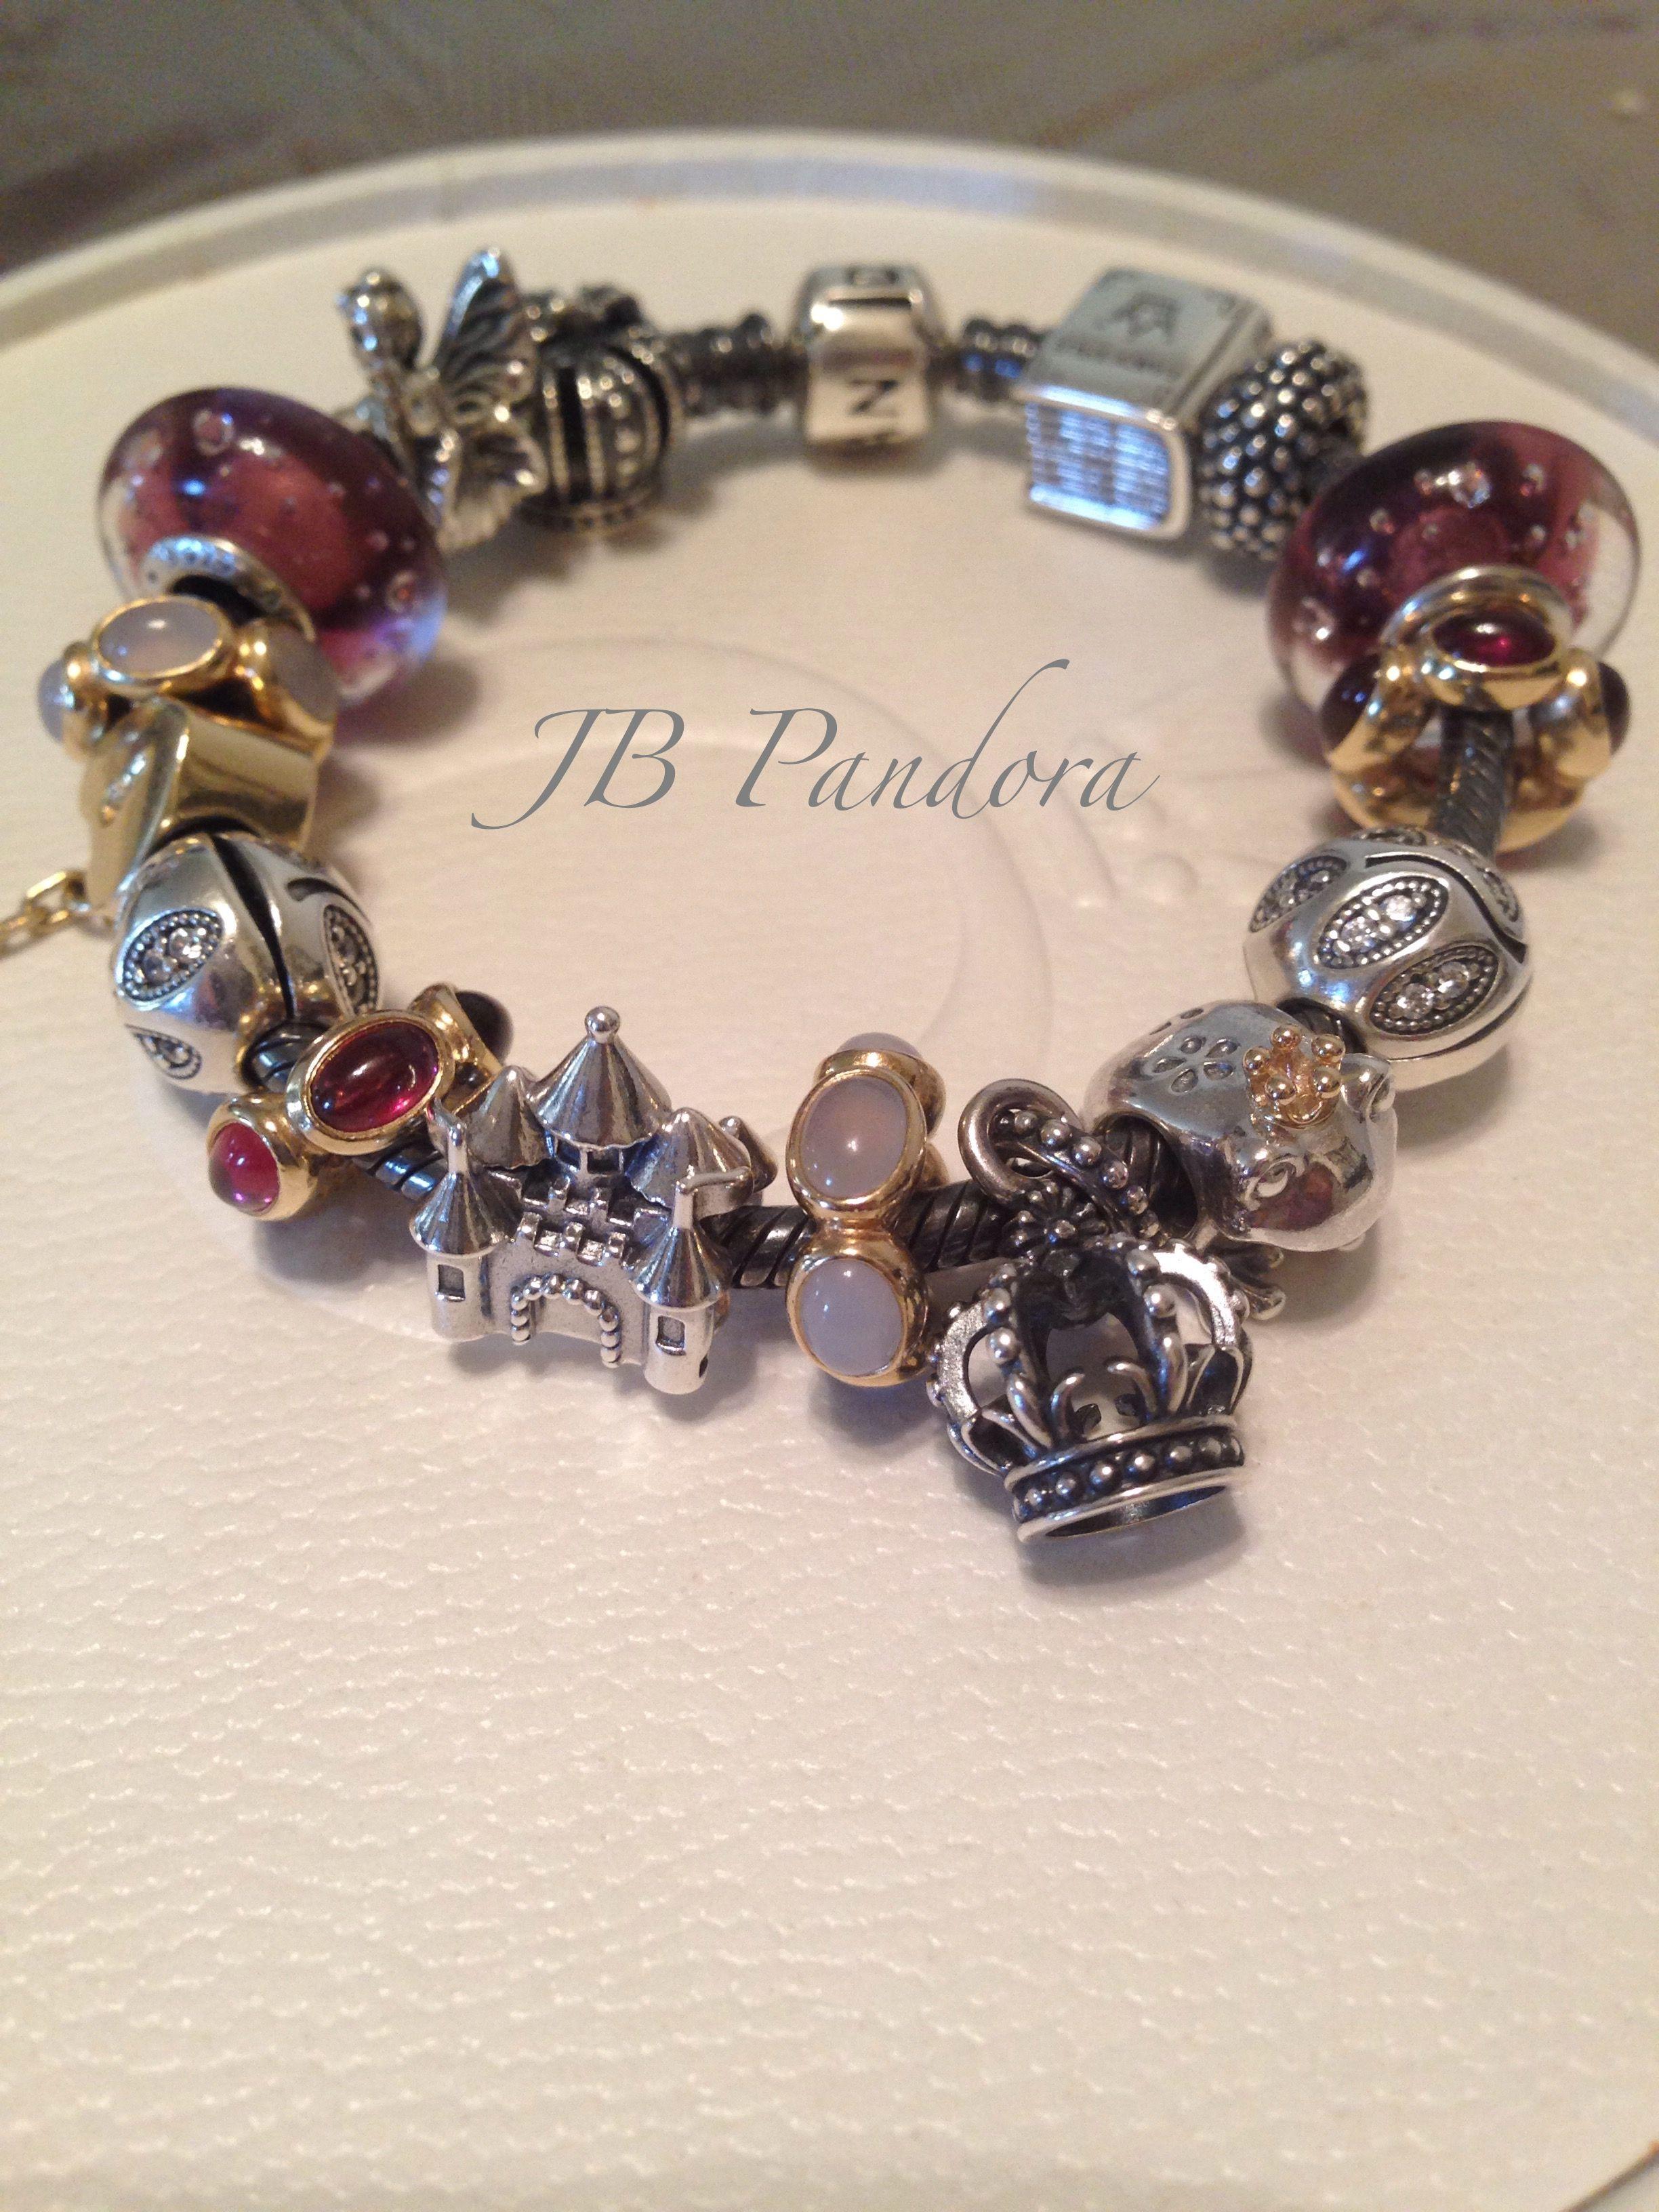 My Pandora Fairytale Bracelet